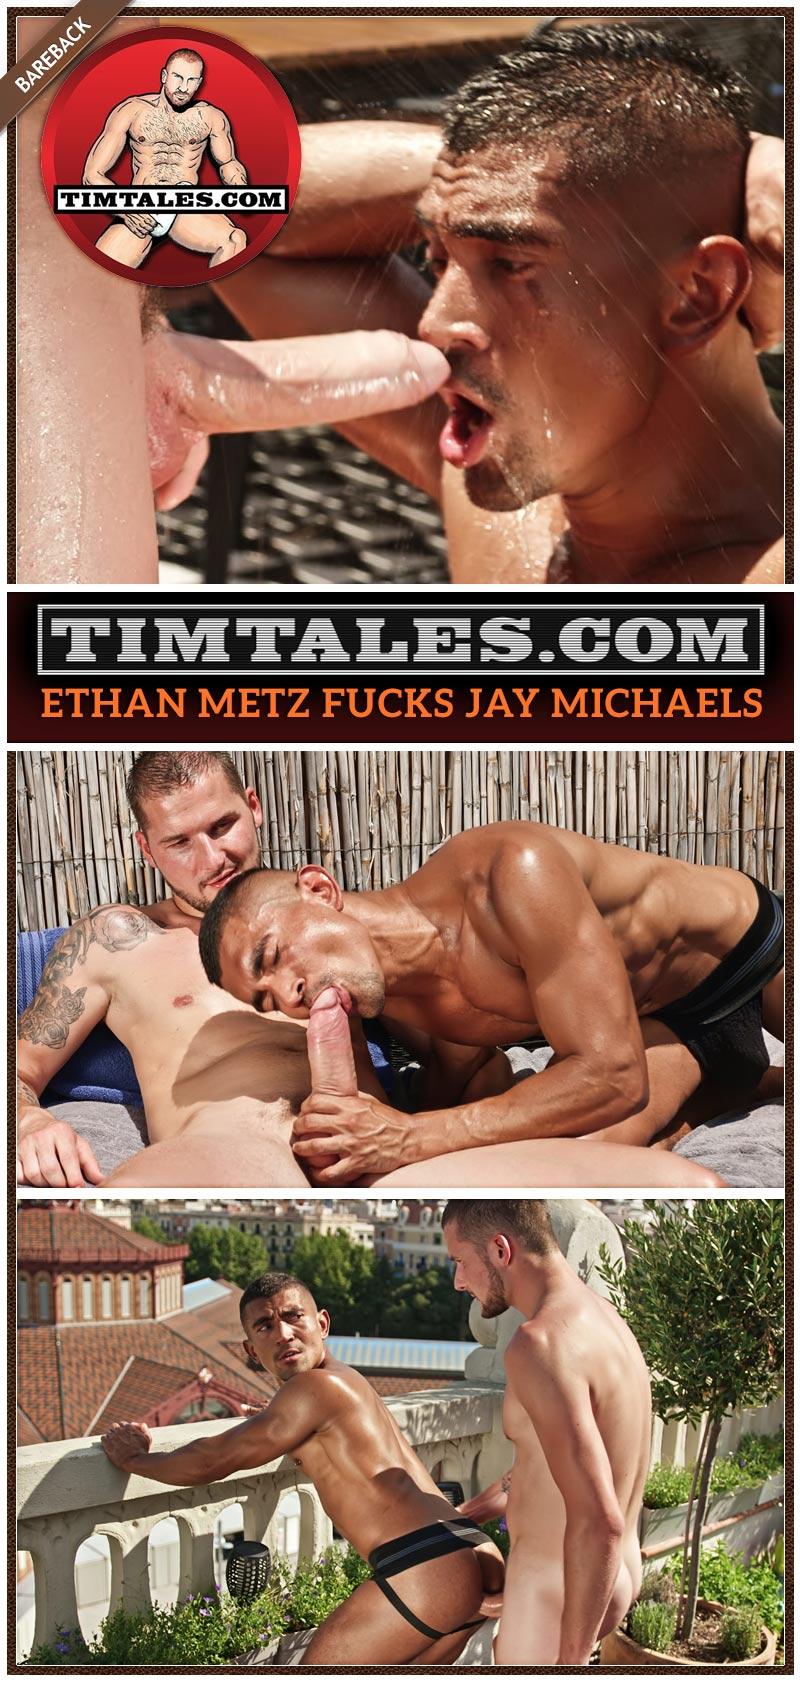 Ethan Metz Fucks Jay Michaels at TimTales